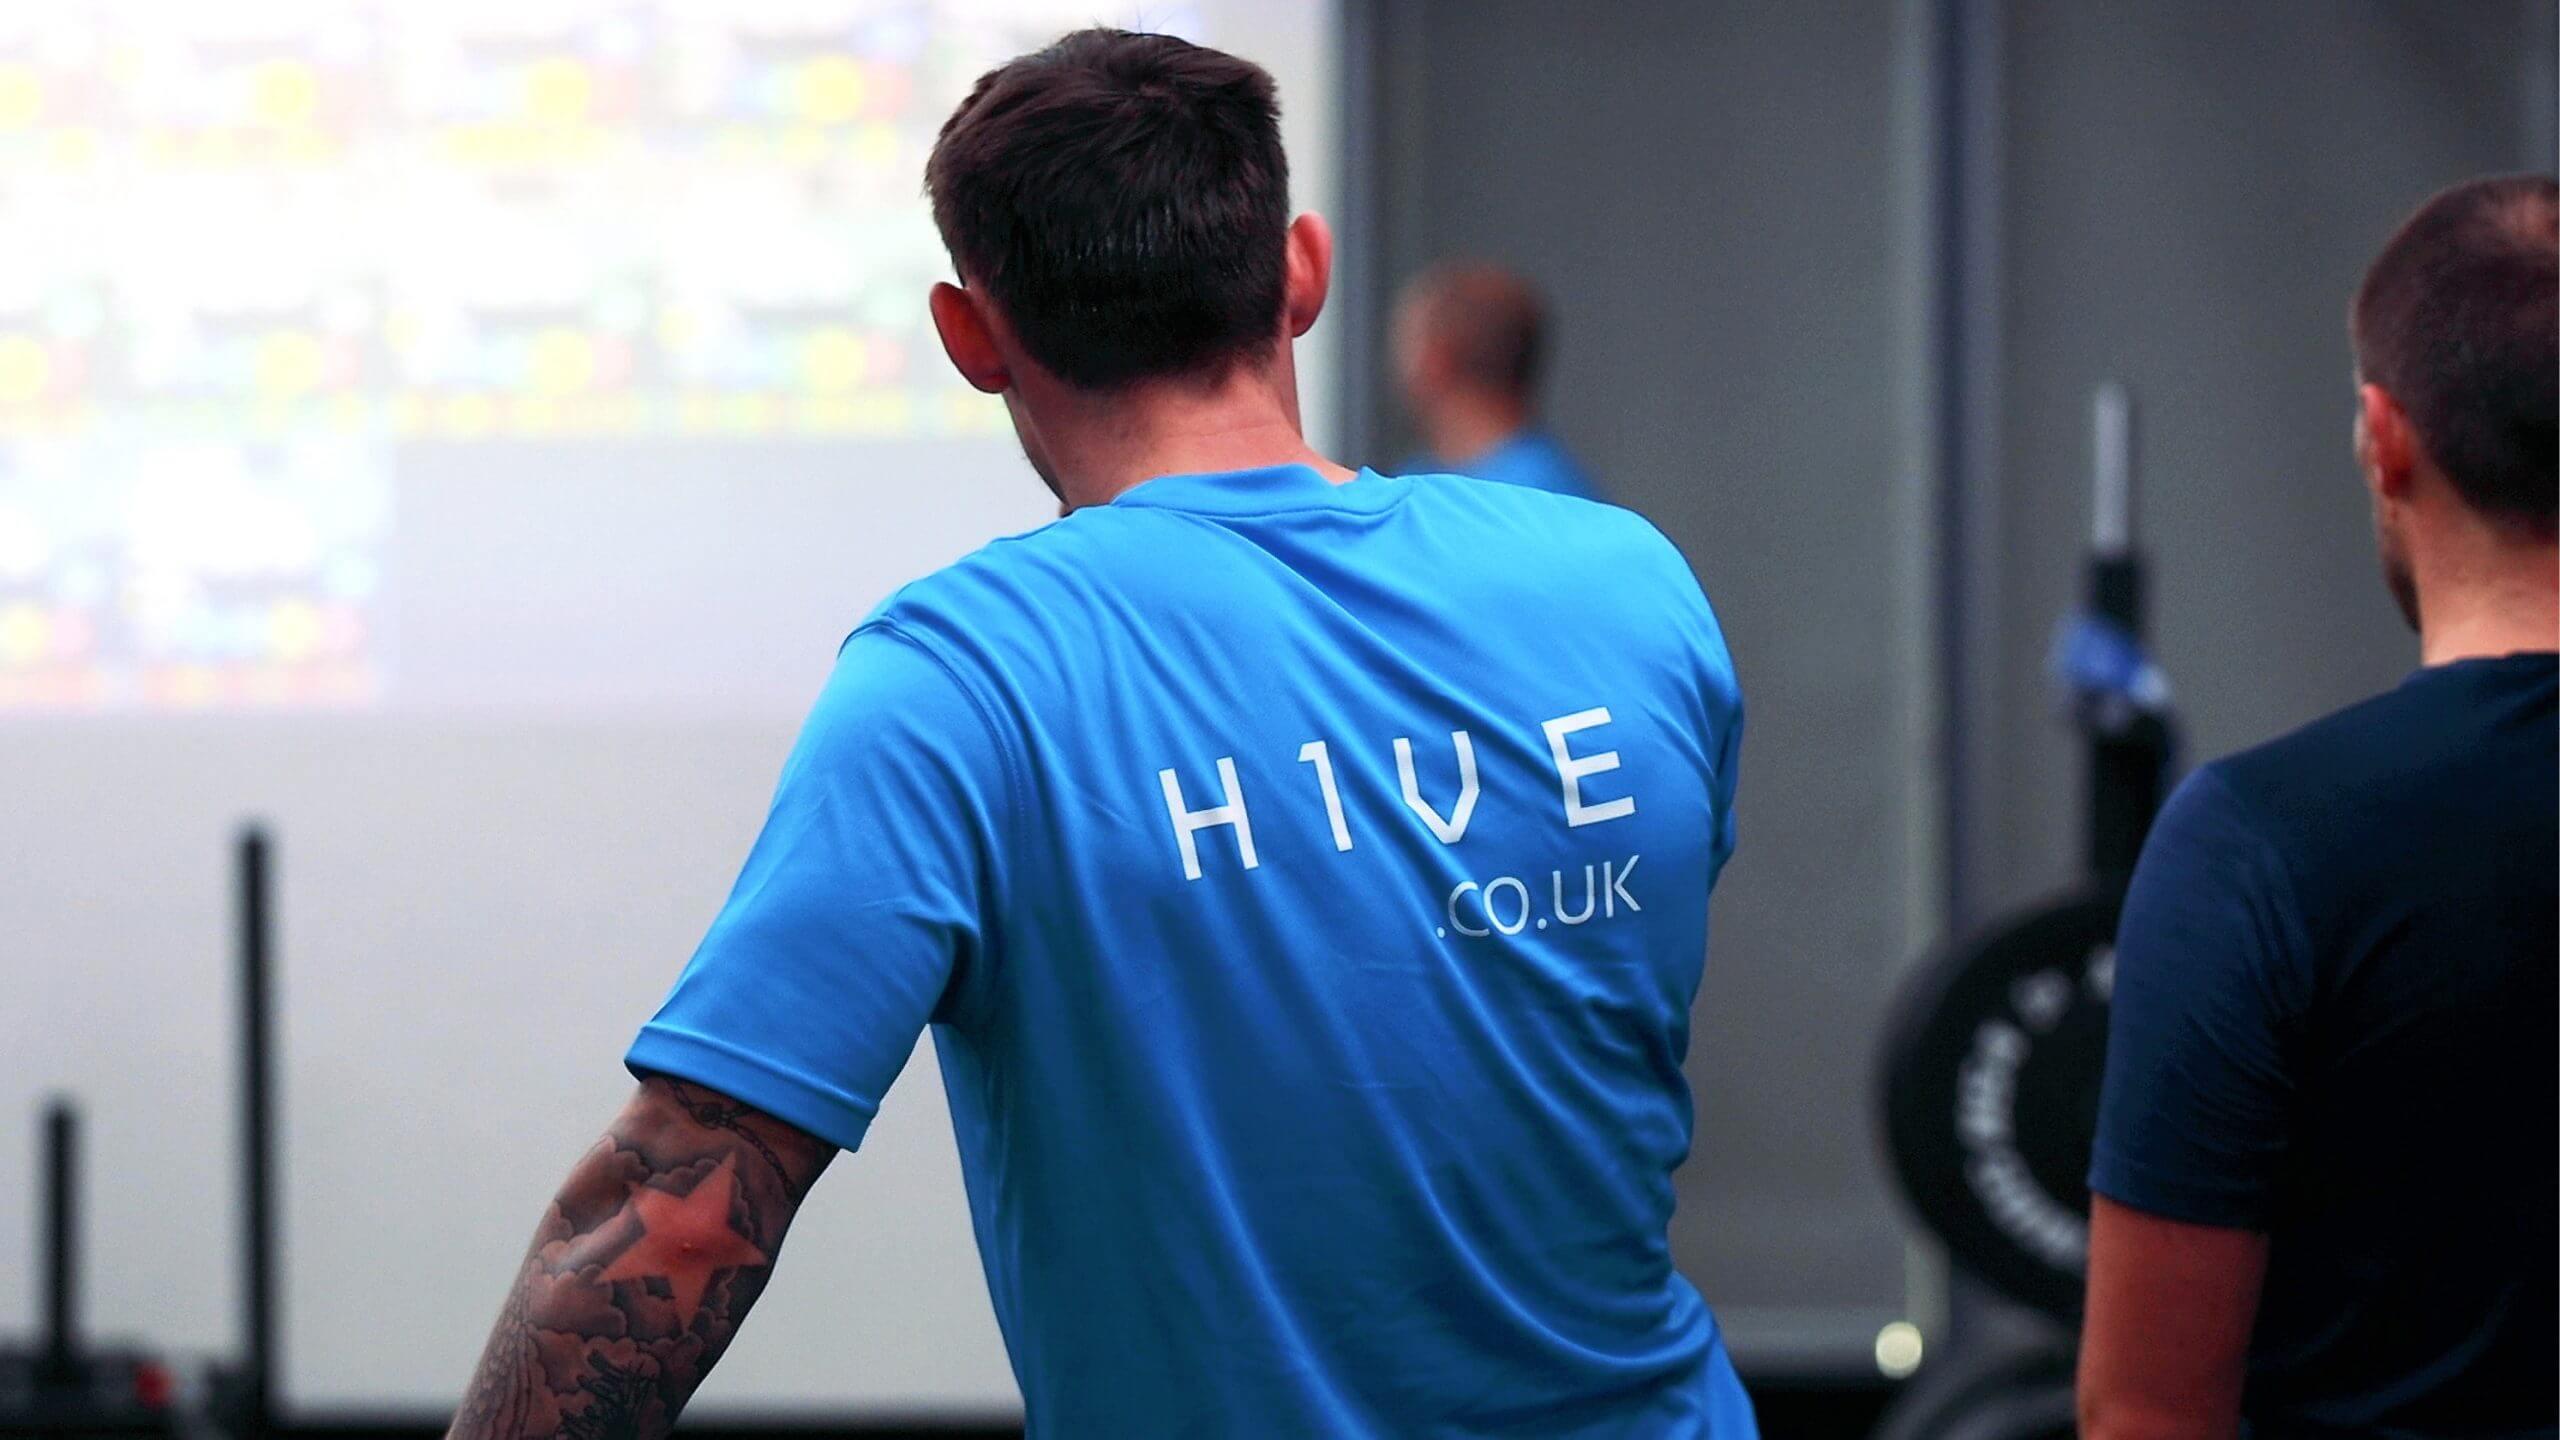 H1VE t-shirt